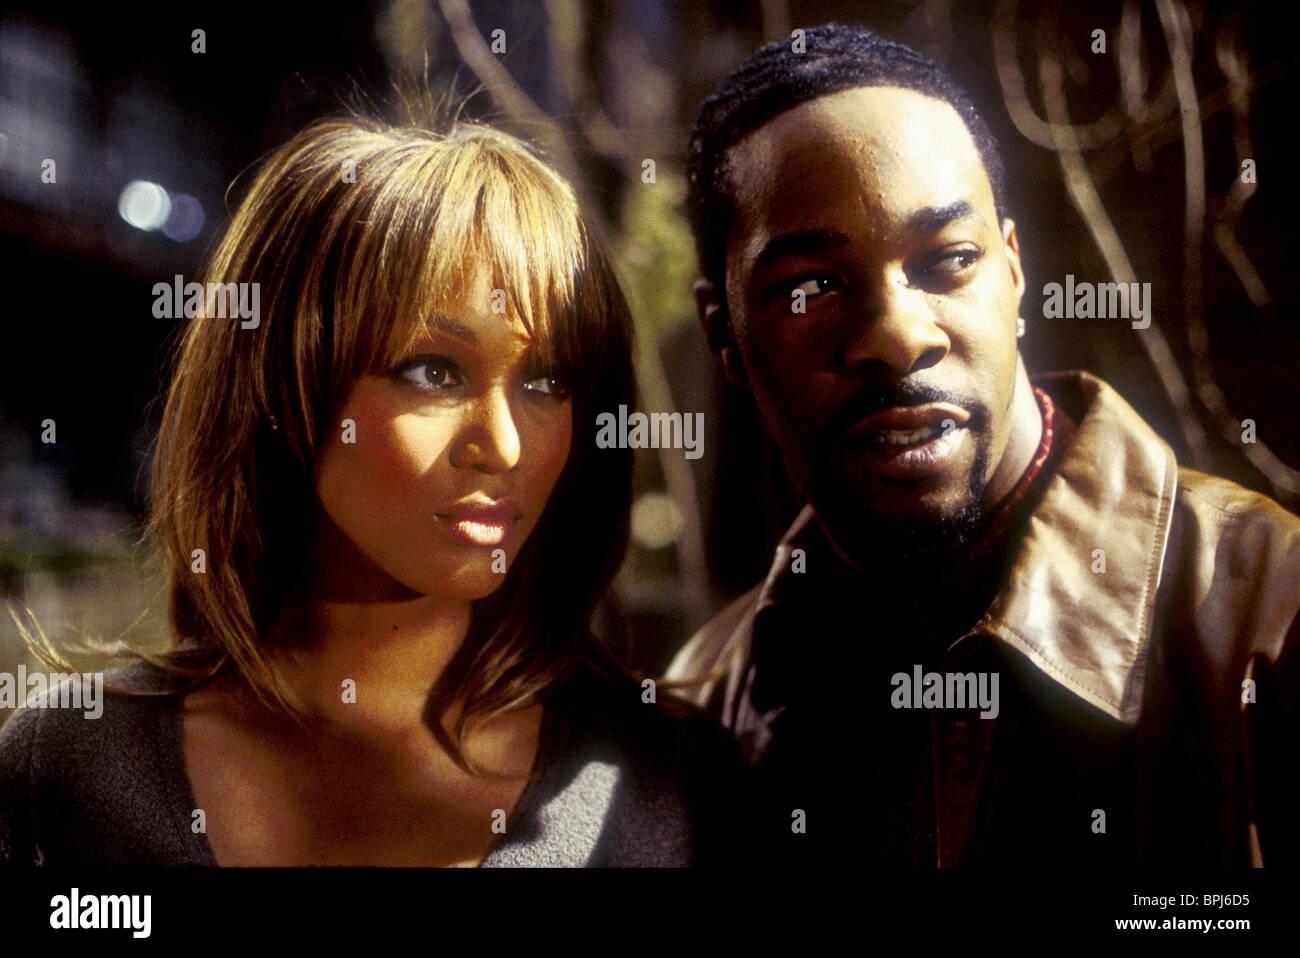 tyra banks & busta rhymes halloween: resurrection; halloween 8 (2002